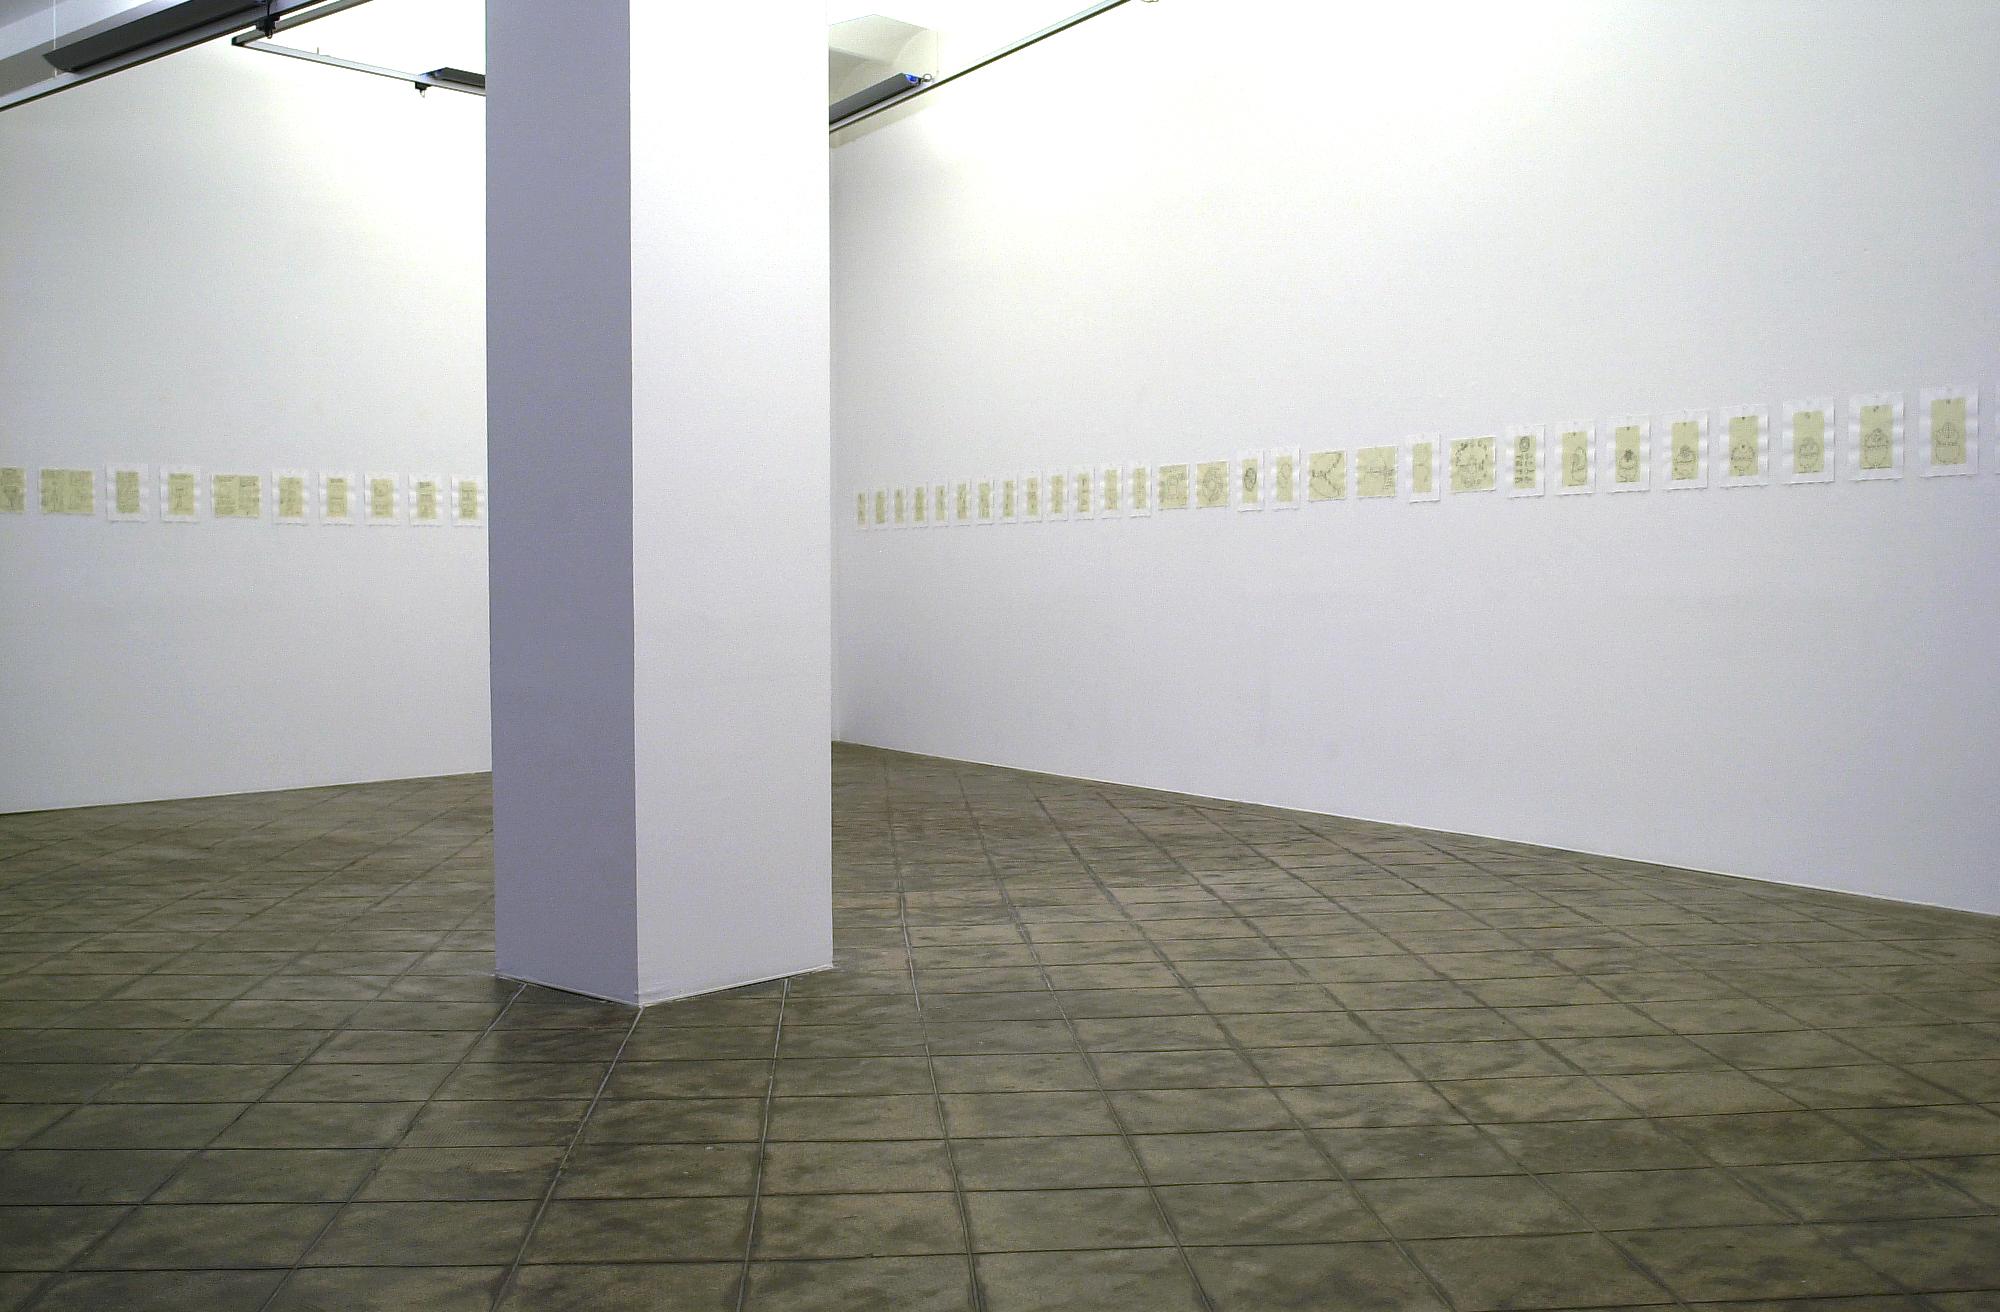 Notating Cosmology, 2008 |  | ProjecteSD